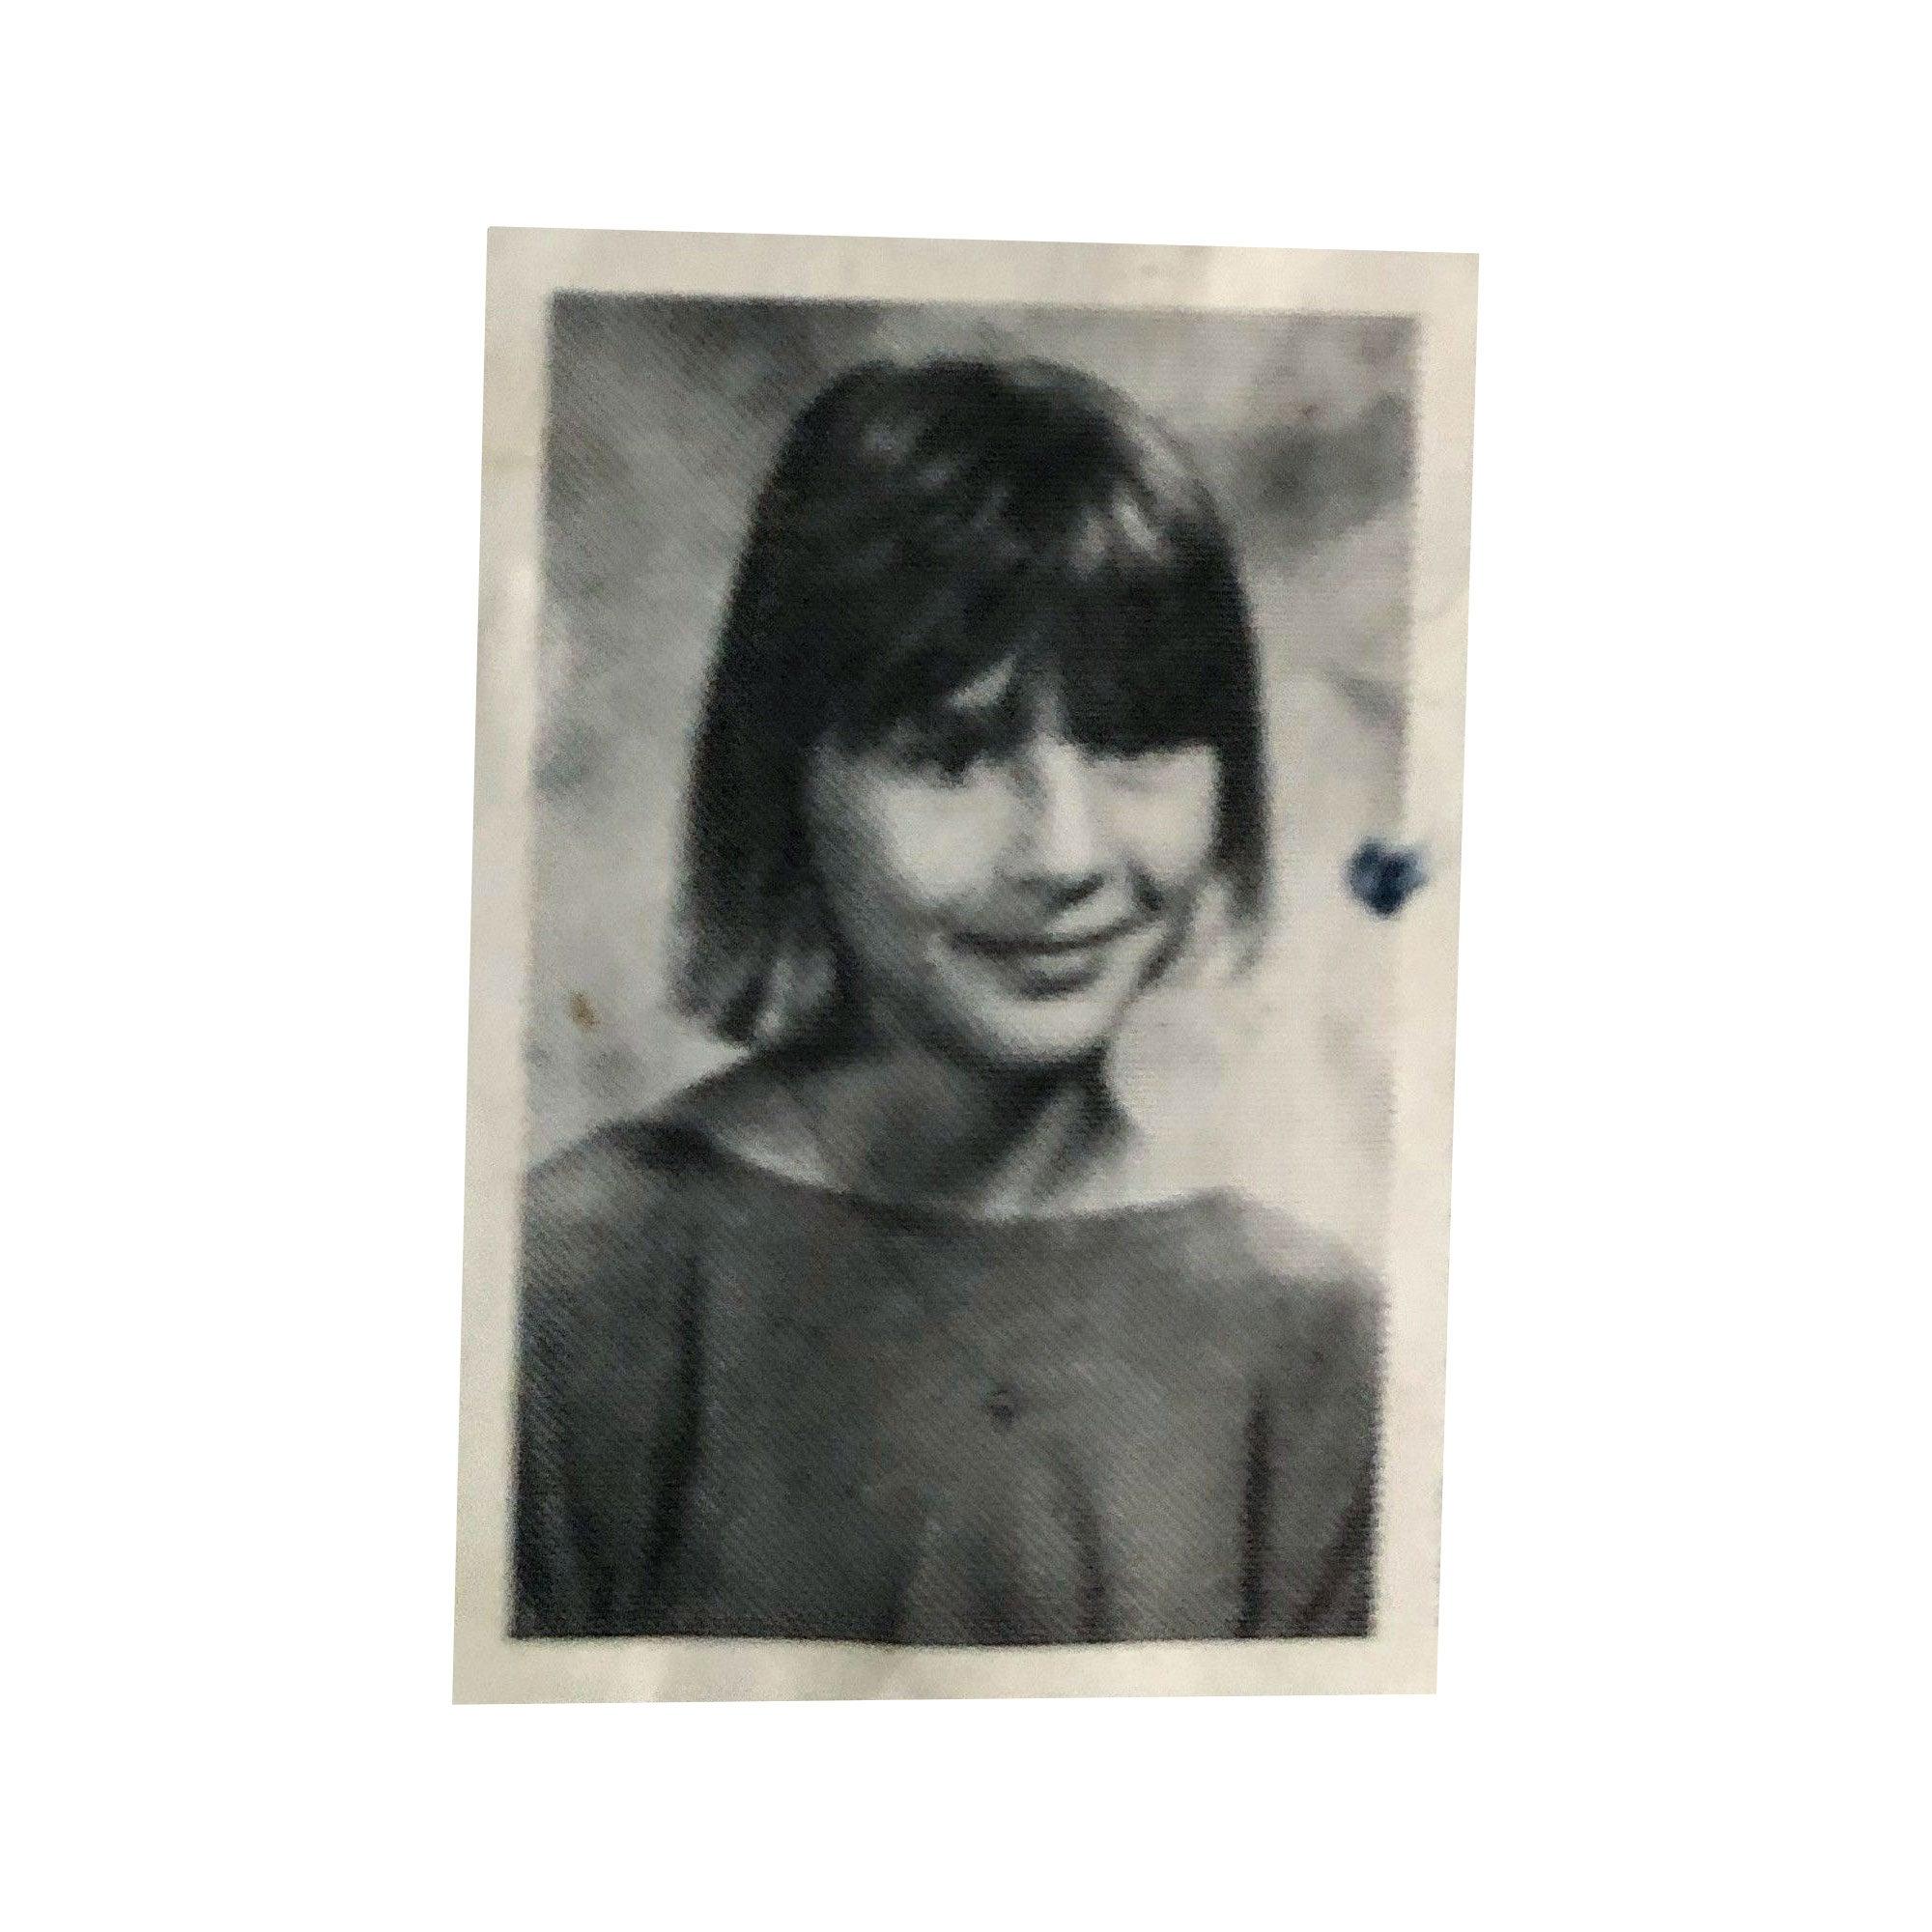 Eve Peyton as a child